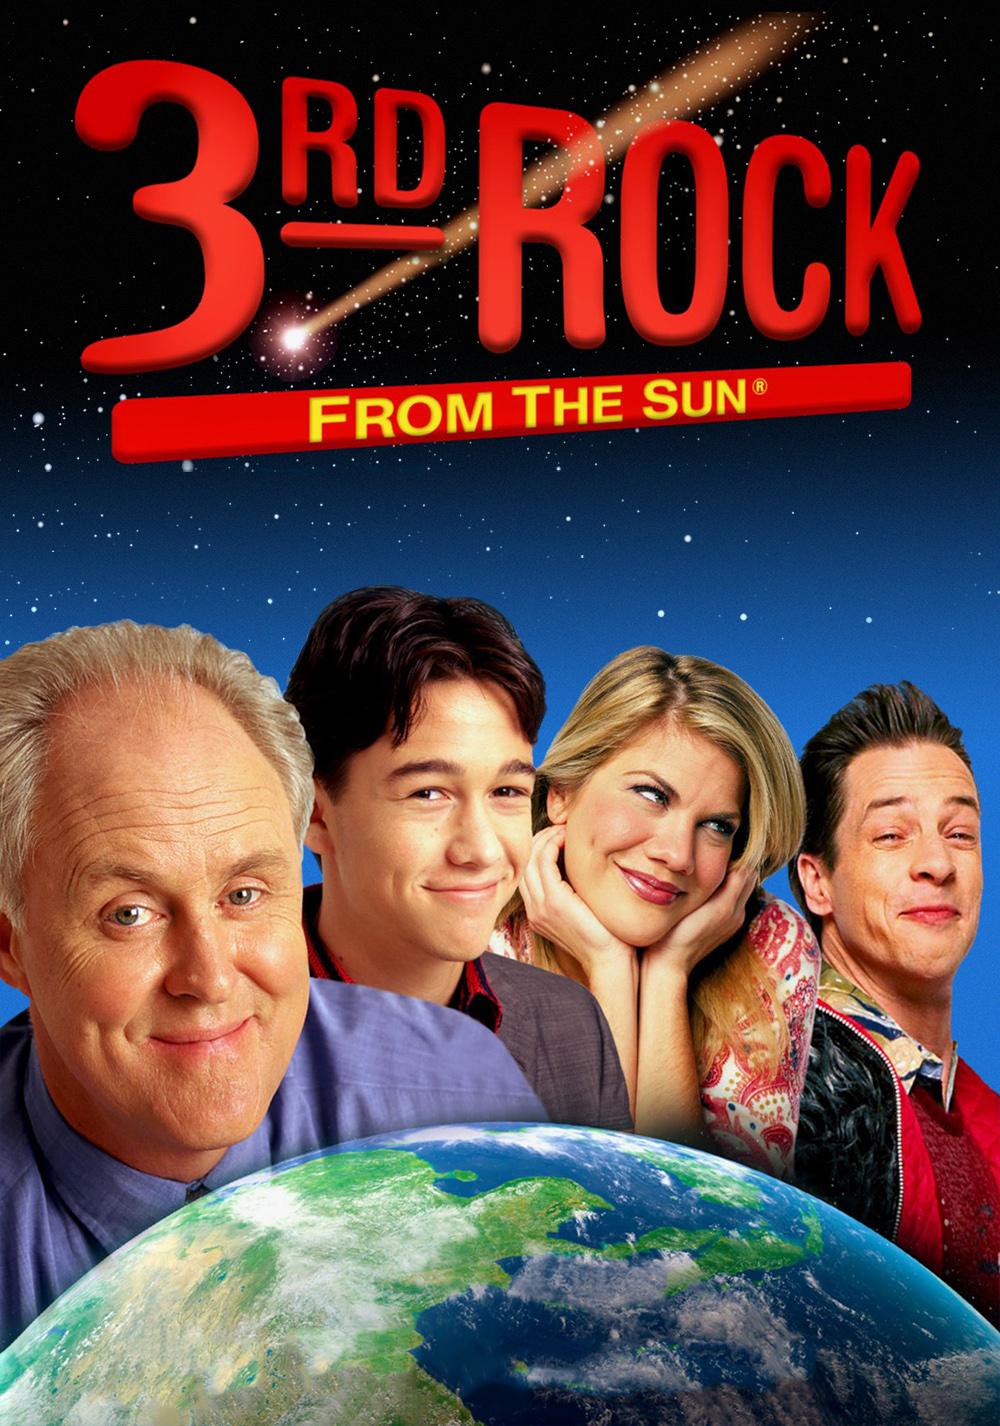 3rd Rock from the Sun | TV fanart | fanart.tv